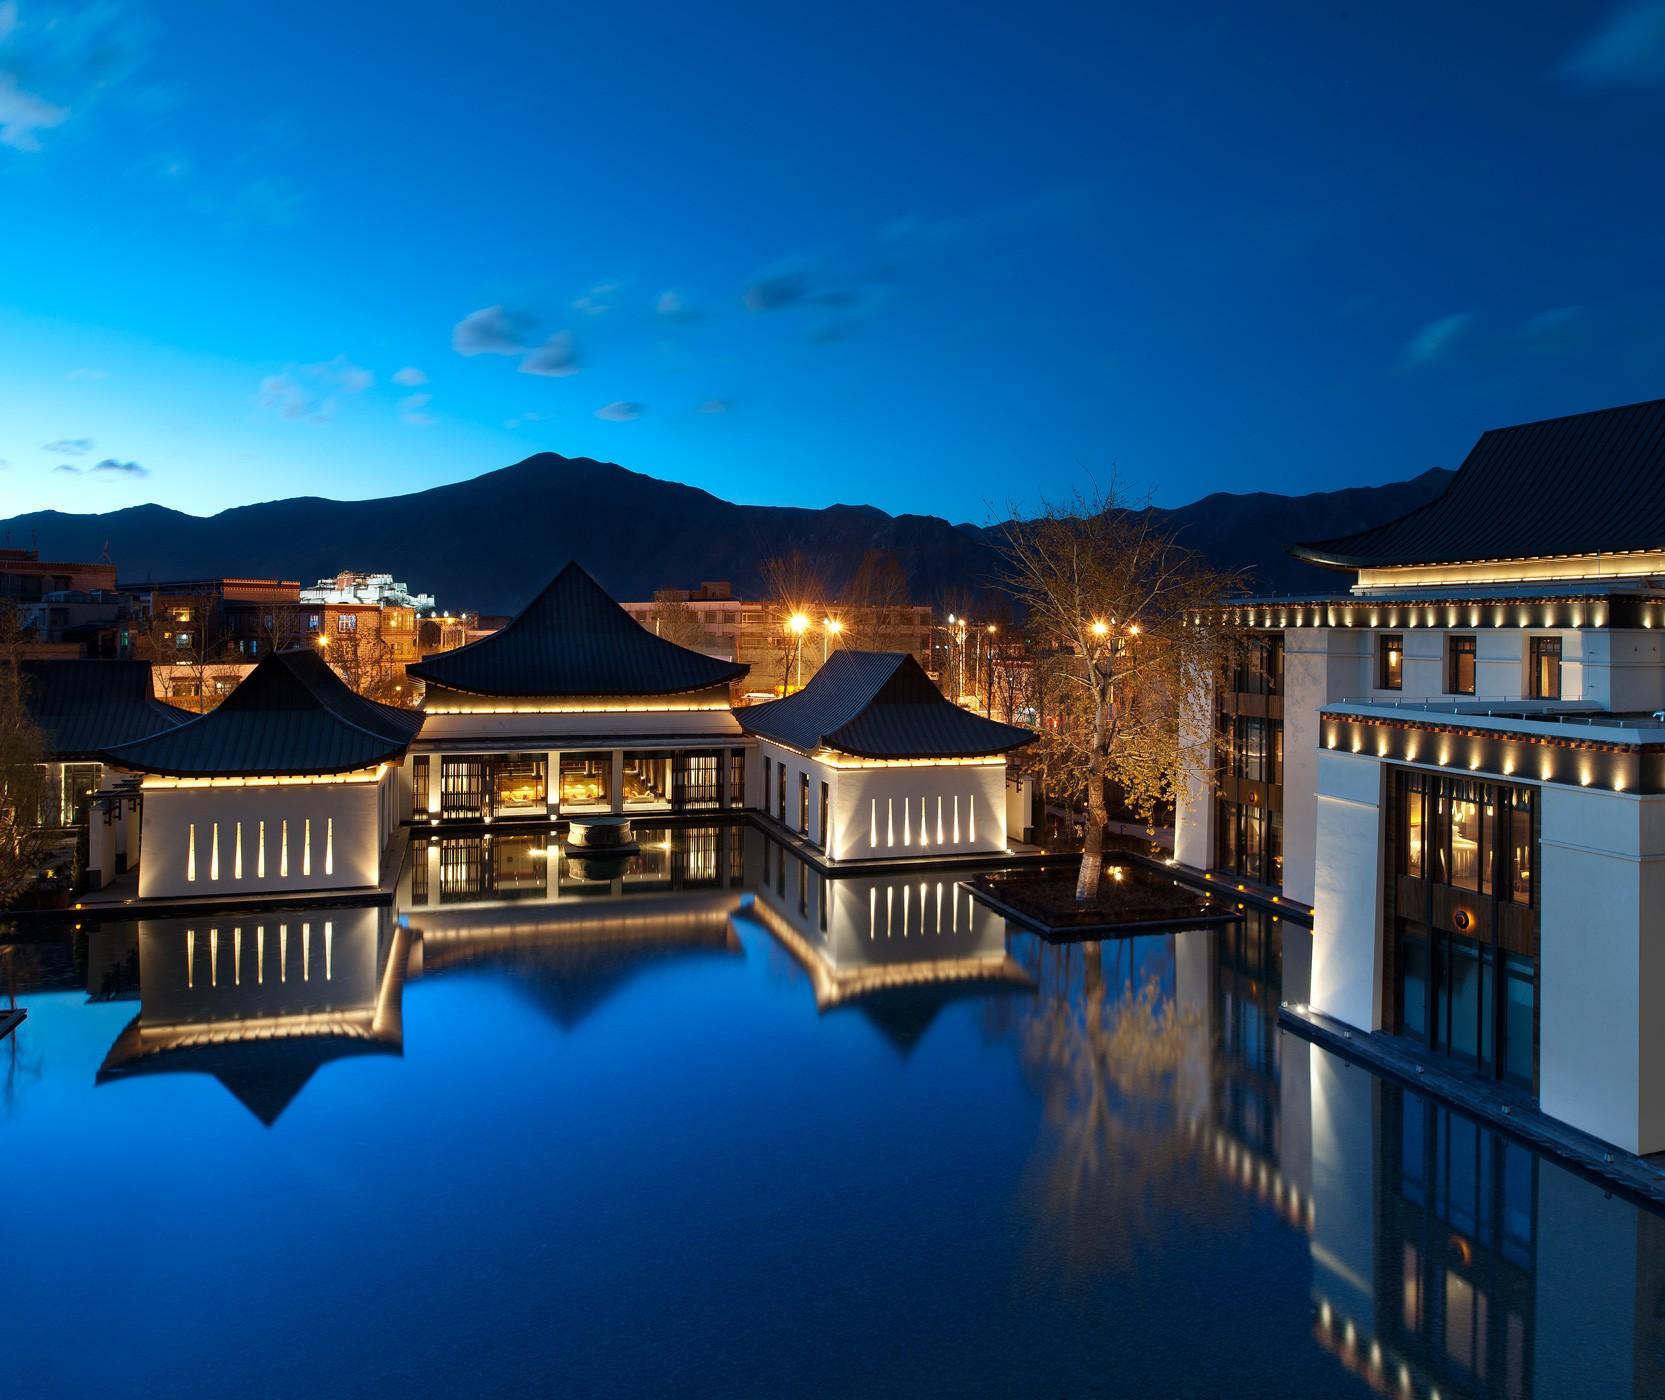 Lhasa_Tibet_010